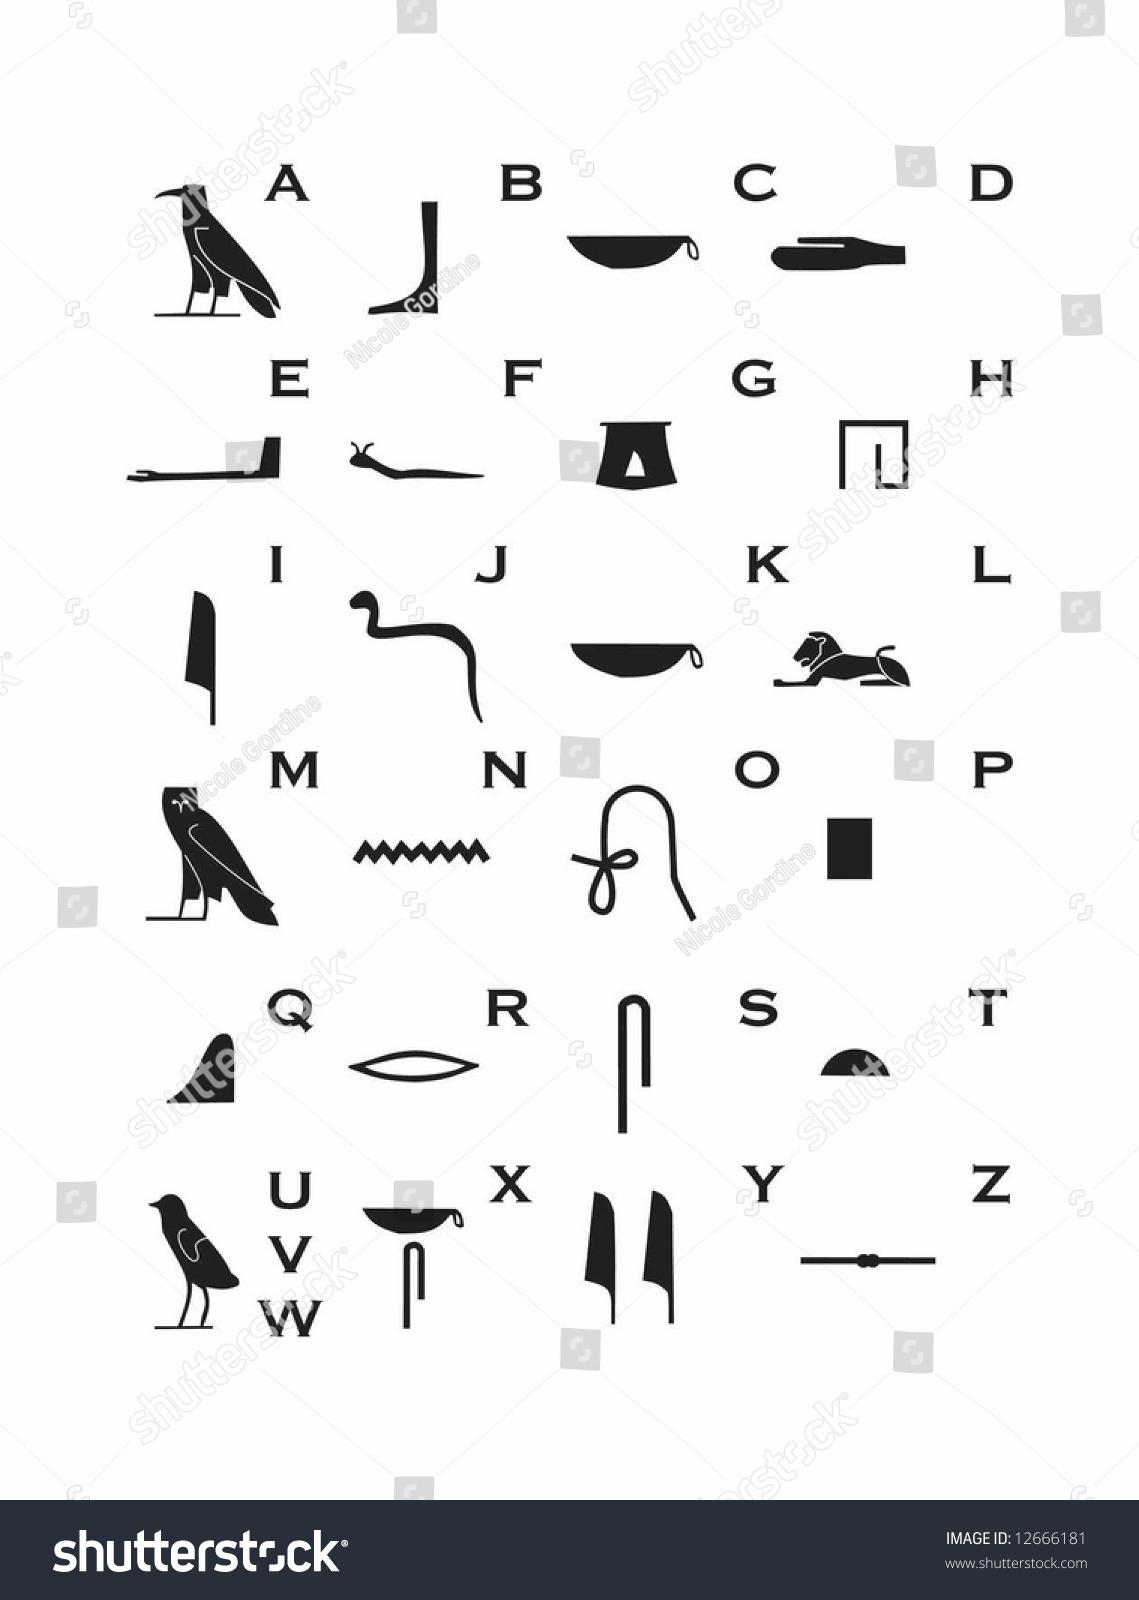 Hieroglyphic Alphabet Stock Vector 12666181 : Shutterstock